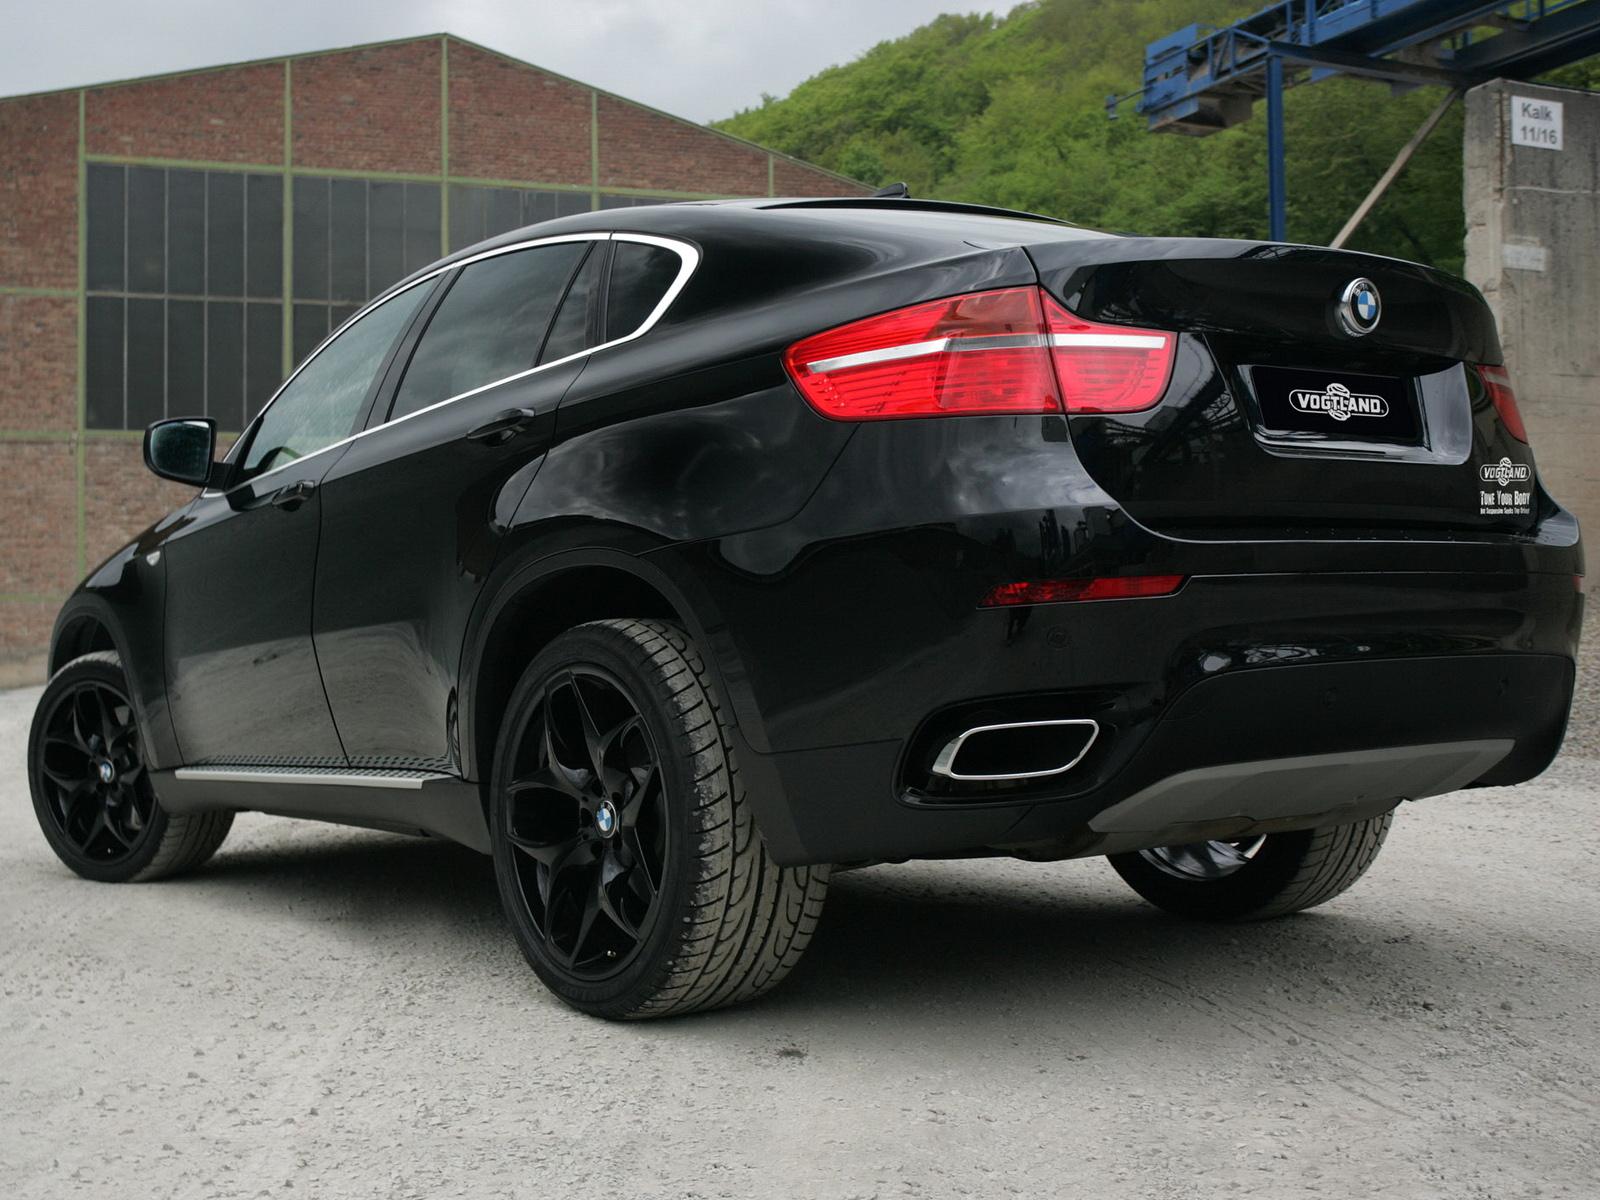 Bmw X Black Wallpaper Cars Wallpaper - Black bmw x6